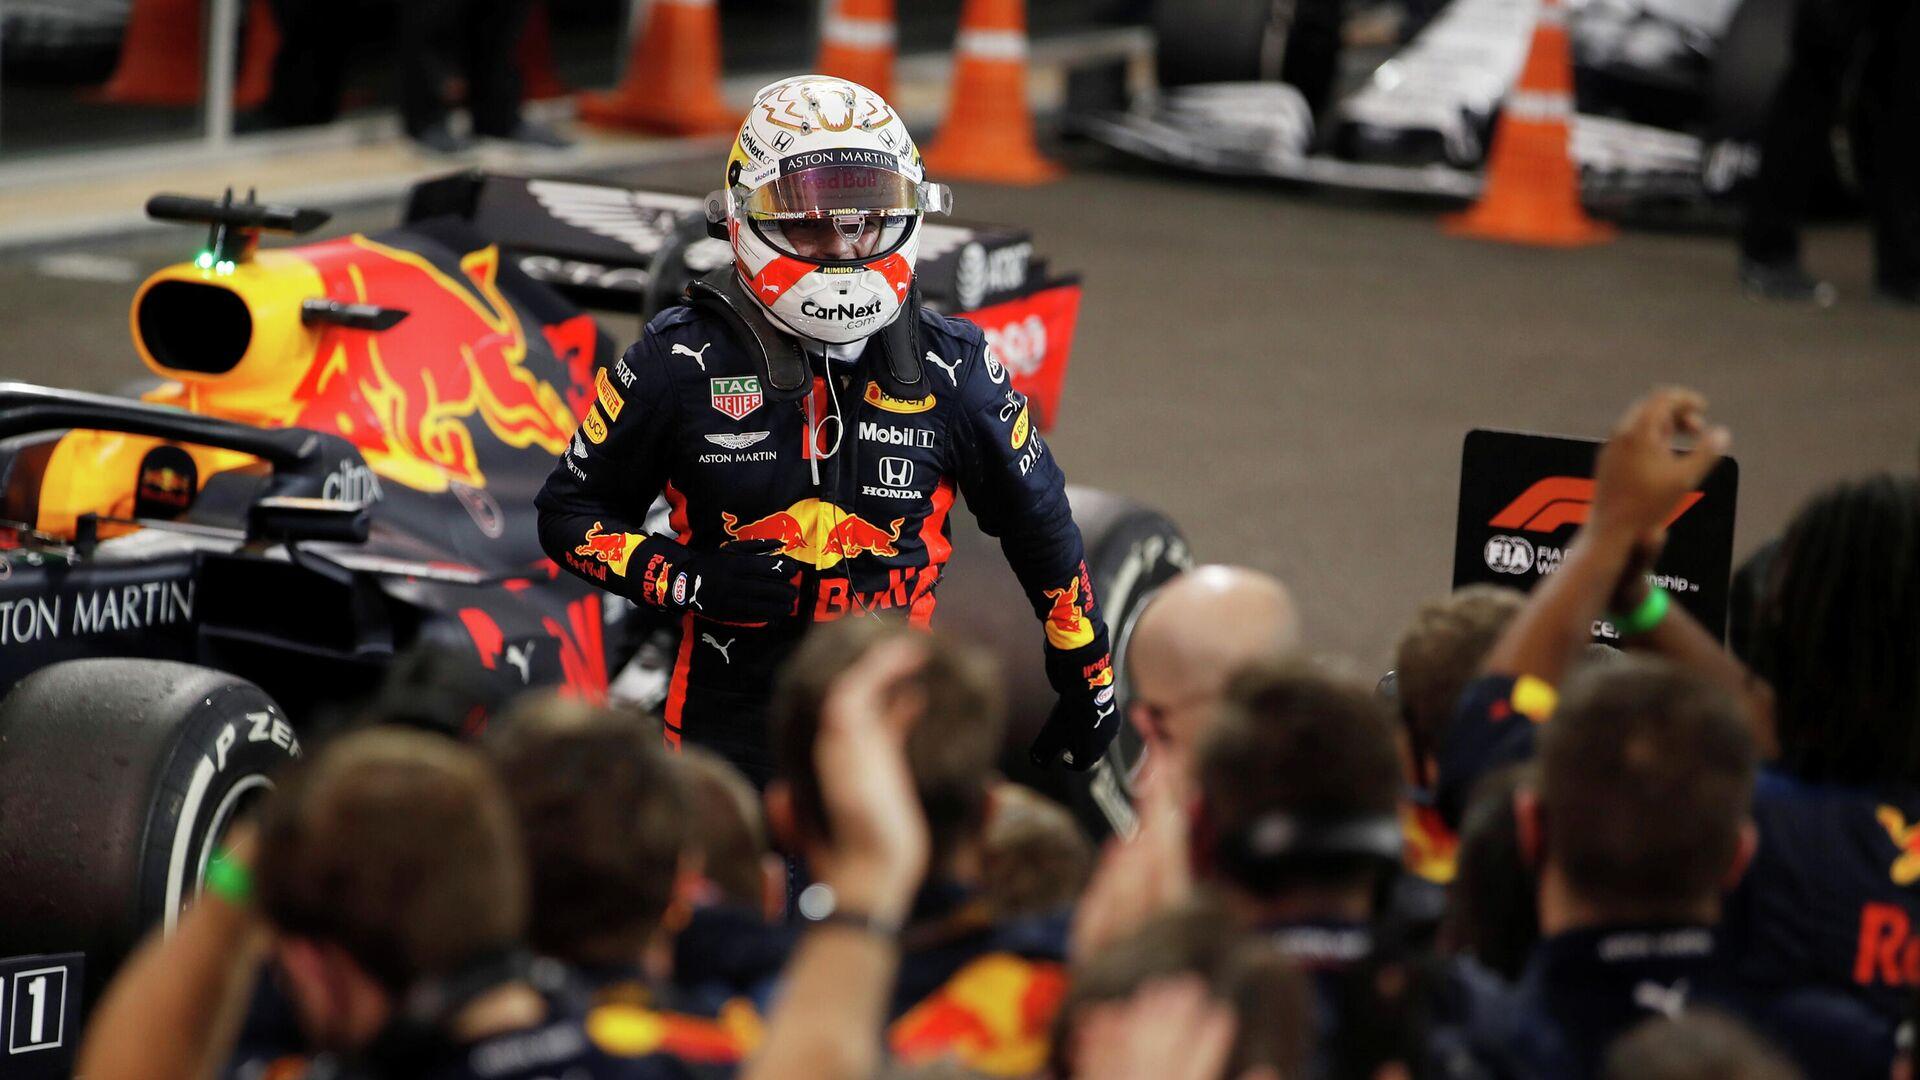 Max Verstappen feiert Sieg beim Abu Dhabi Grand Prix, VAE, der 13. Dezember 2020  - SNA, 1920, 07.01.2021